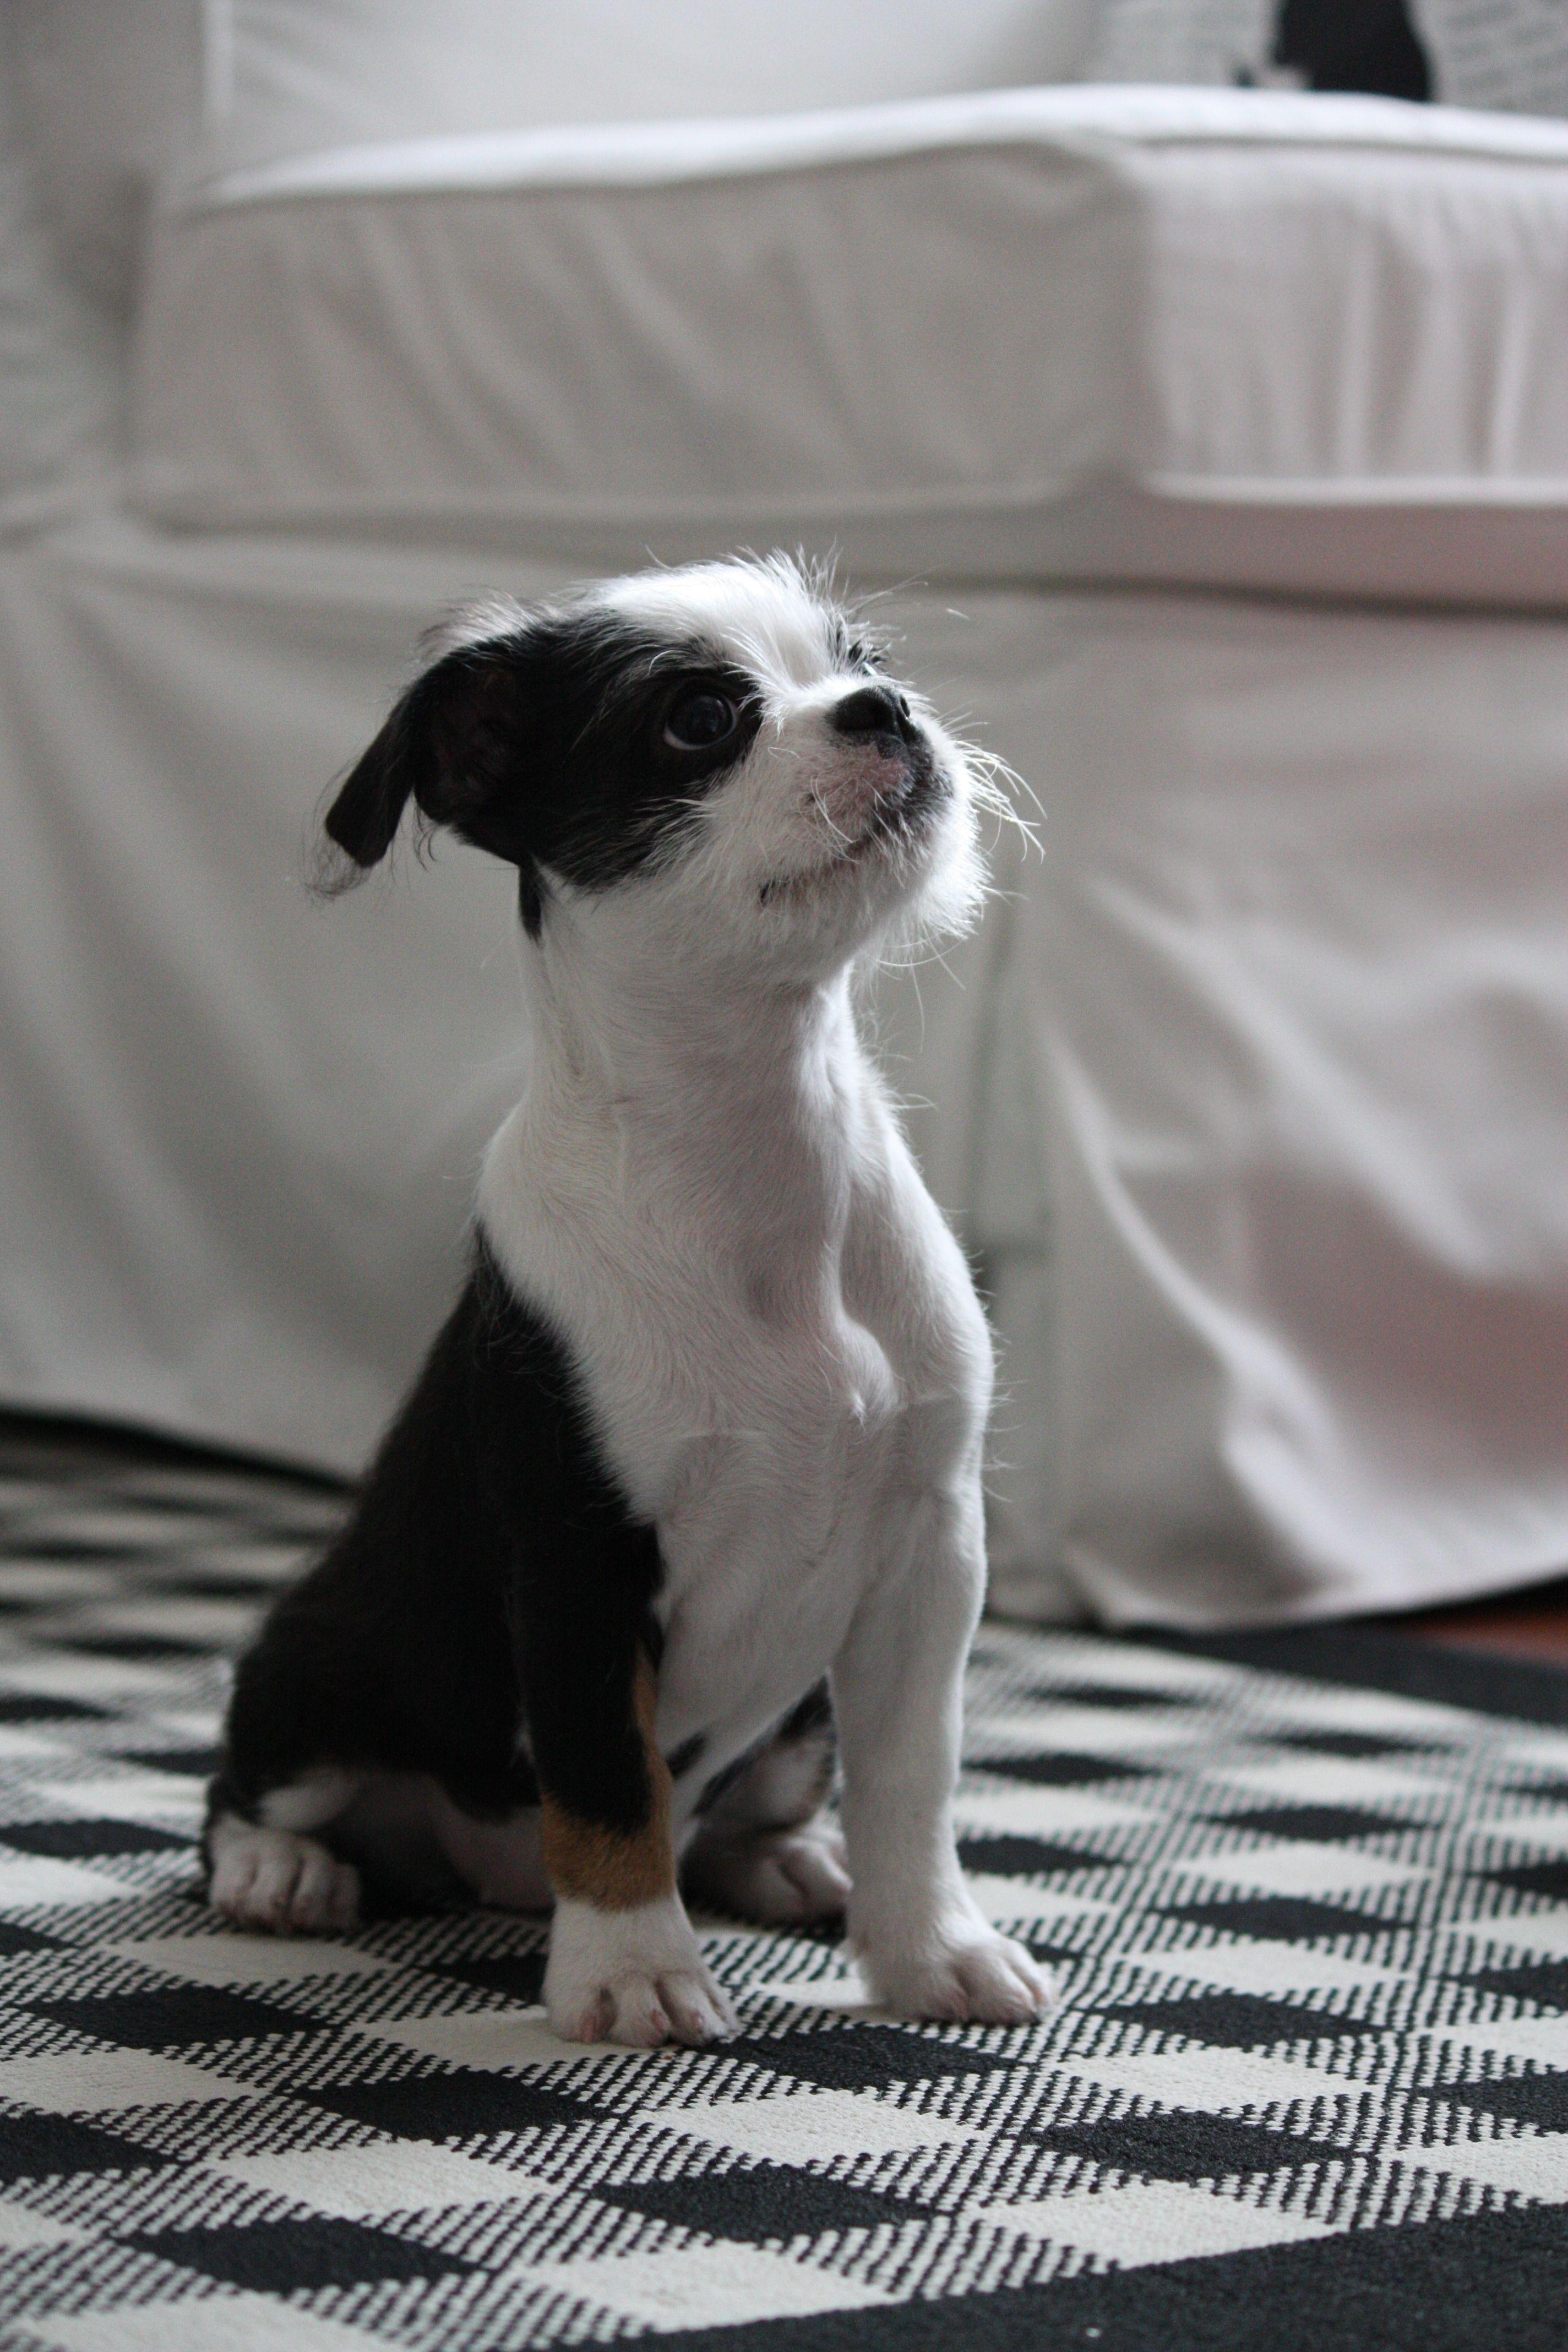 Boston Terrier Shih Tzu Puppy Looks Just Like My Stella Shih Tzu Puppy Boston Terrier Shih Tzu